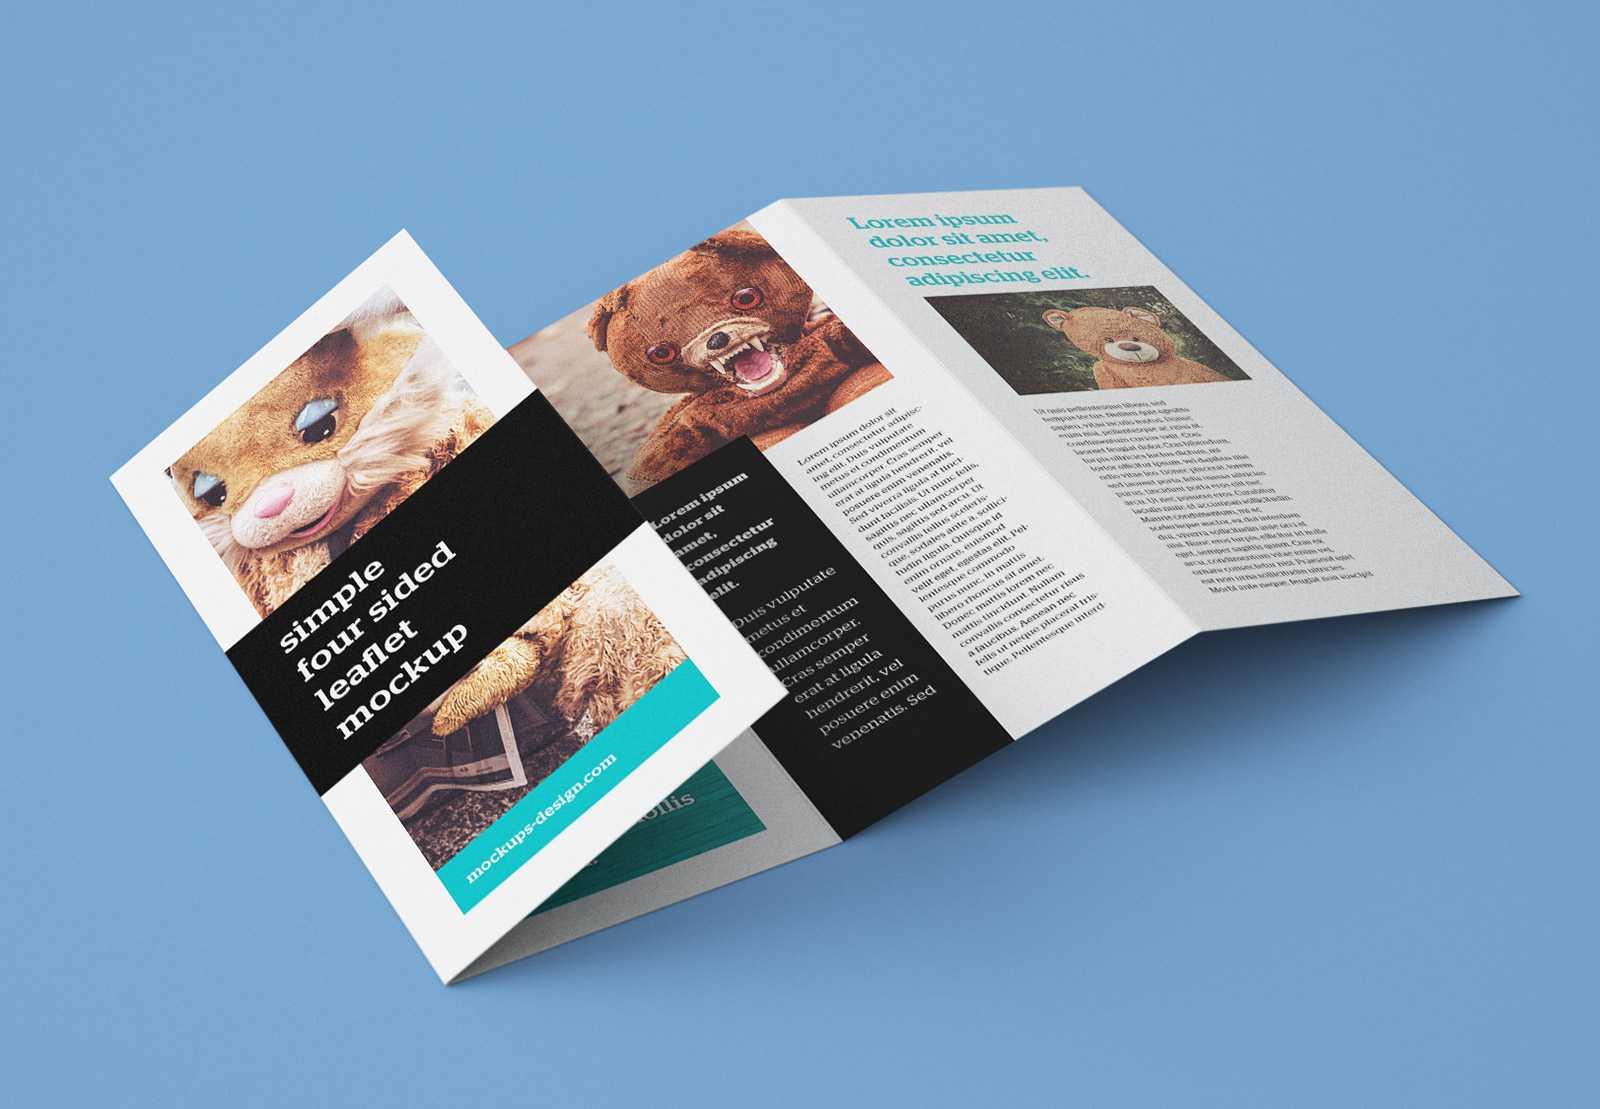 Free Accordion 4 Fold Brochure Leaflet Mockup Psd Templates Throughout 2 Fold Brochure Template Psd